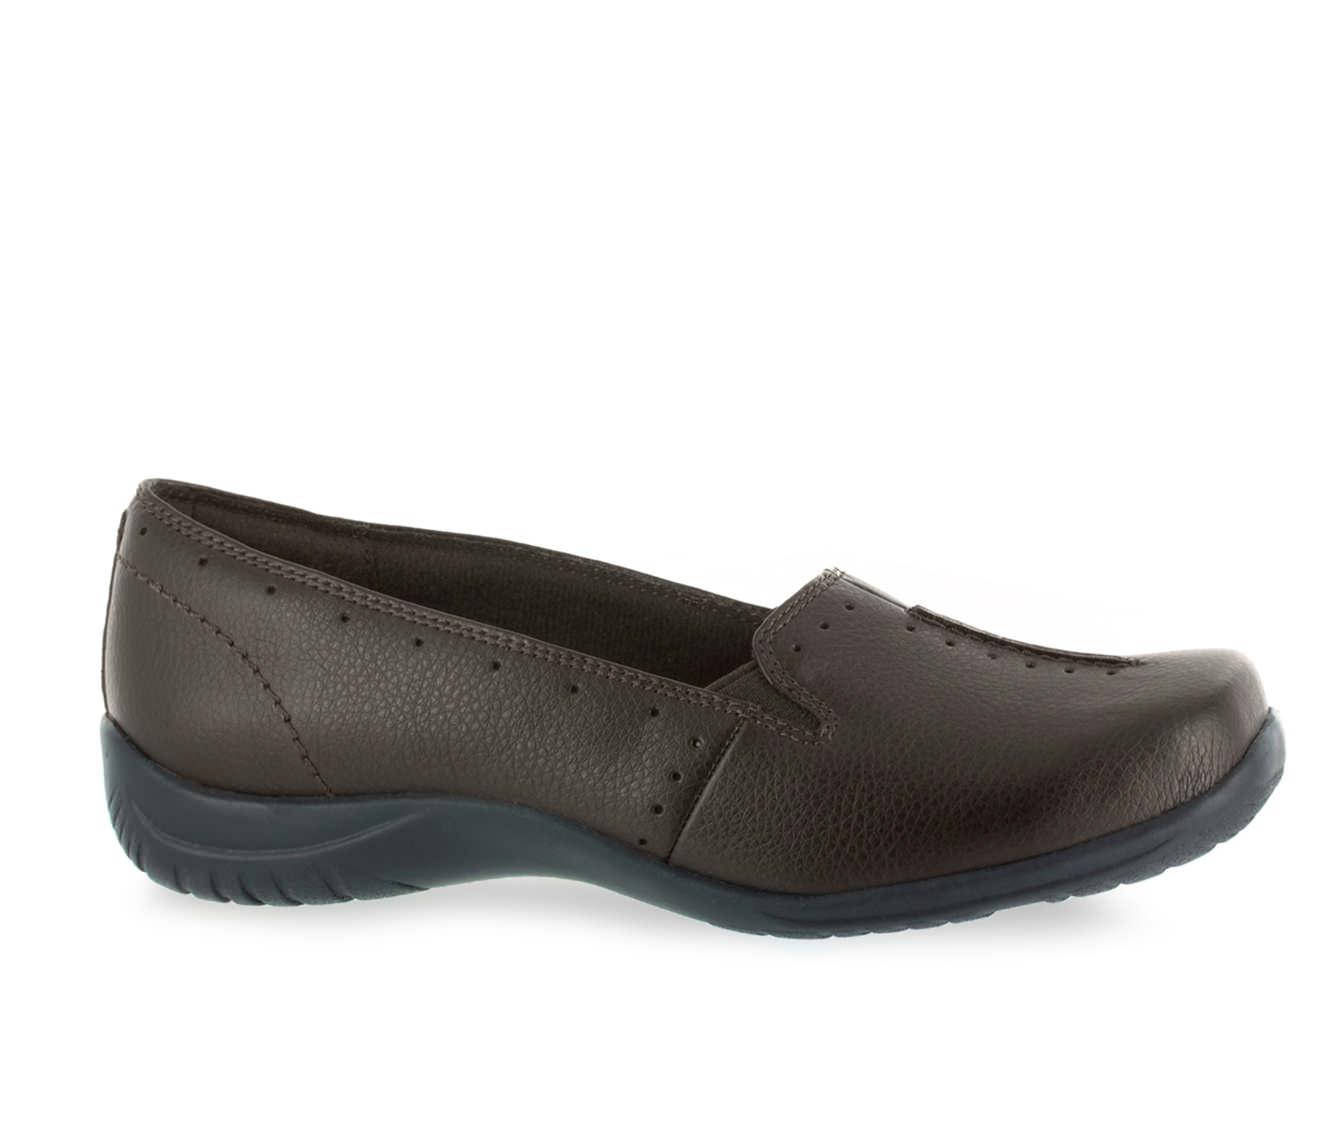 Easy Street Purpose Women's Shoe (Brown Faux Leather)